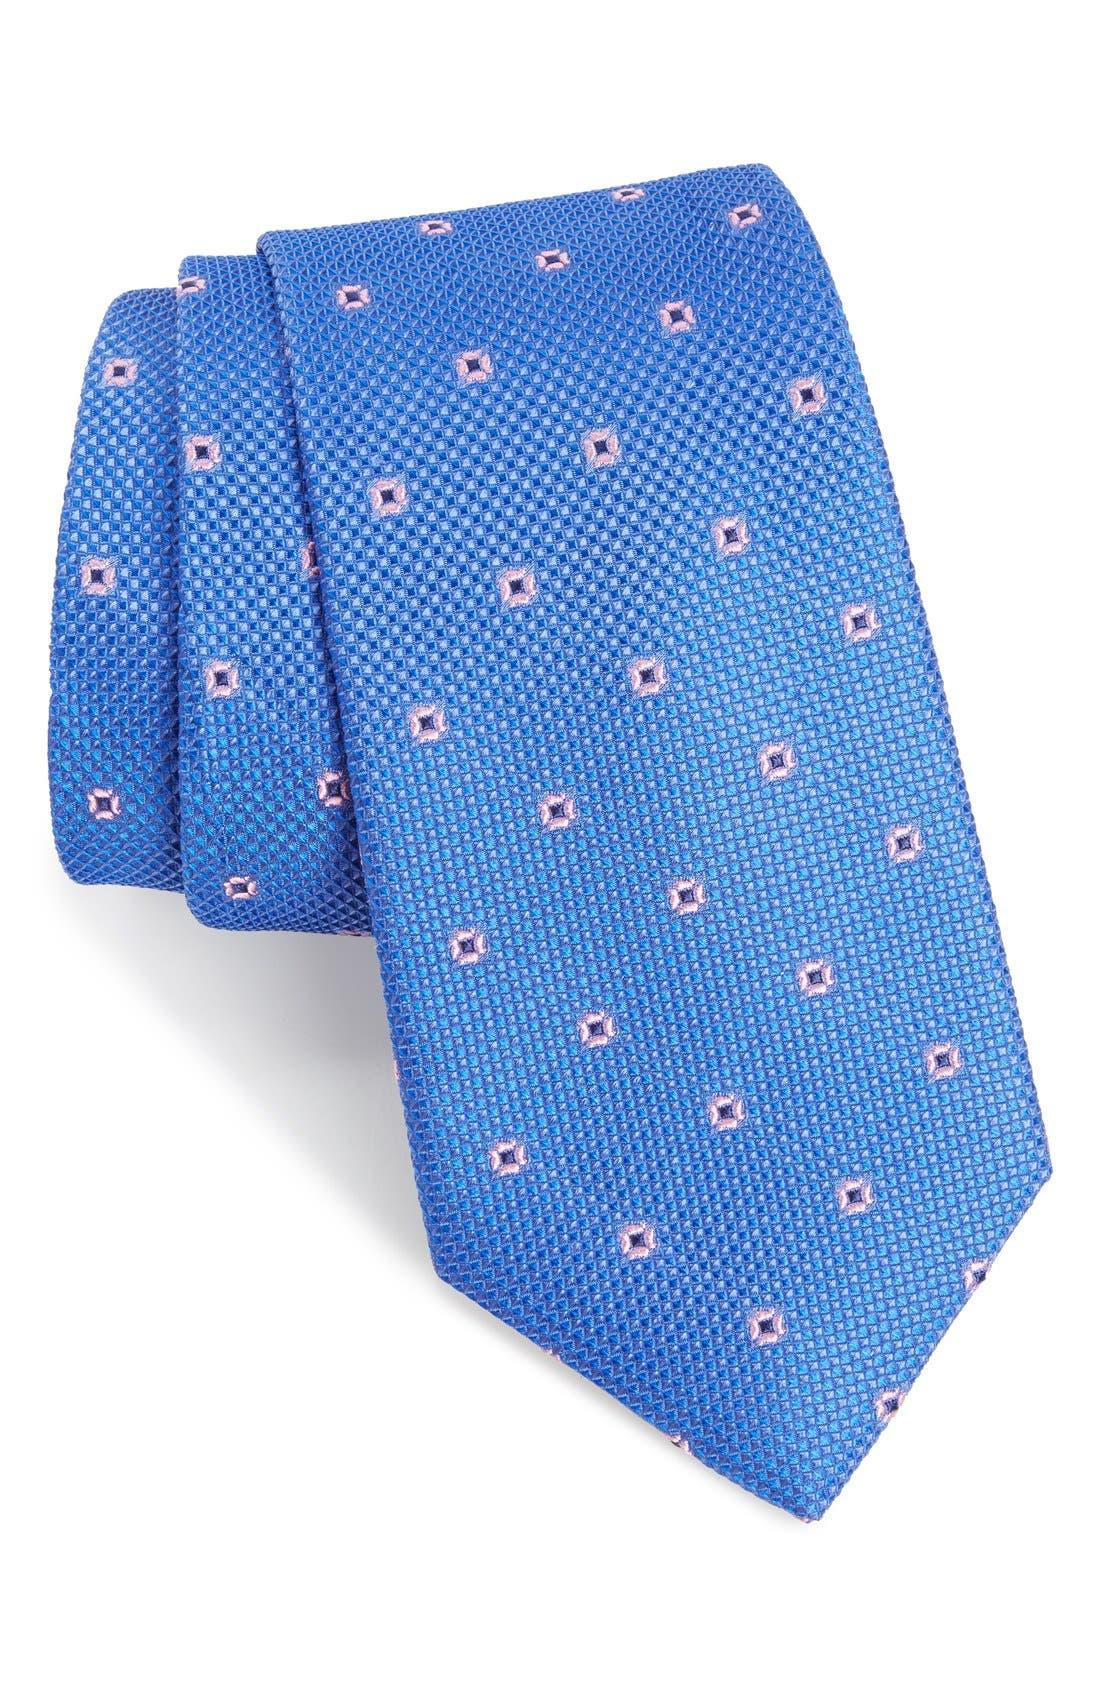 NORDSTROM MEN'S SHOP Dazzle Neat Silk Tie